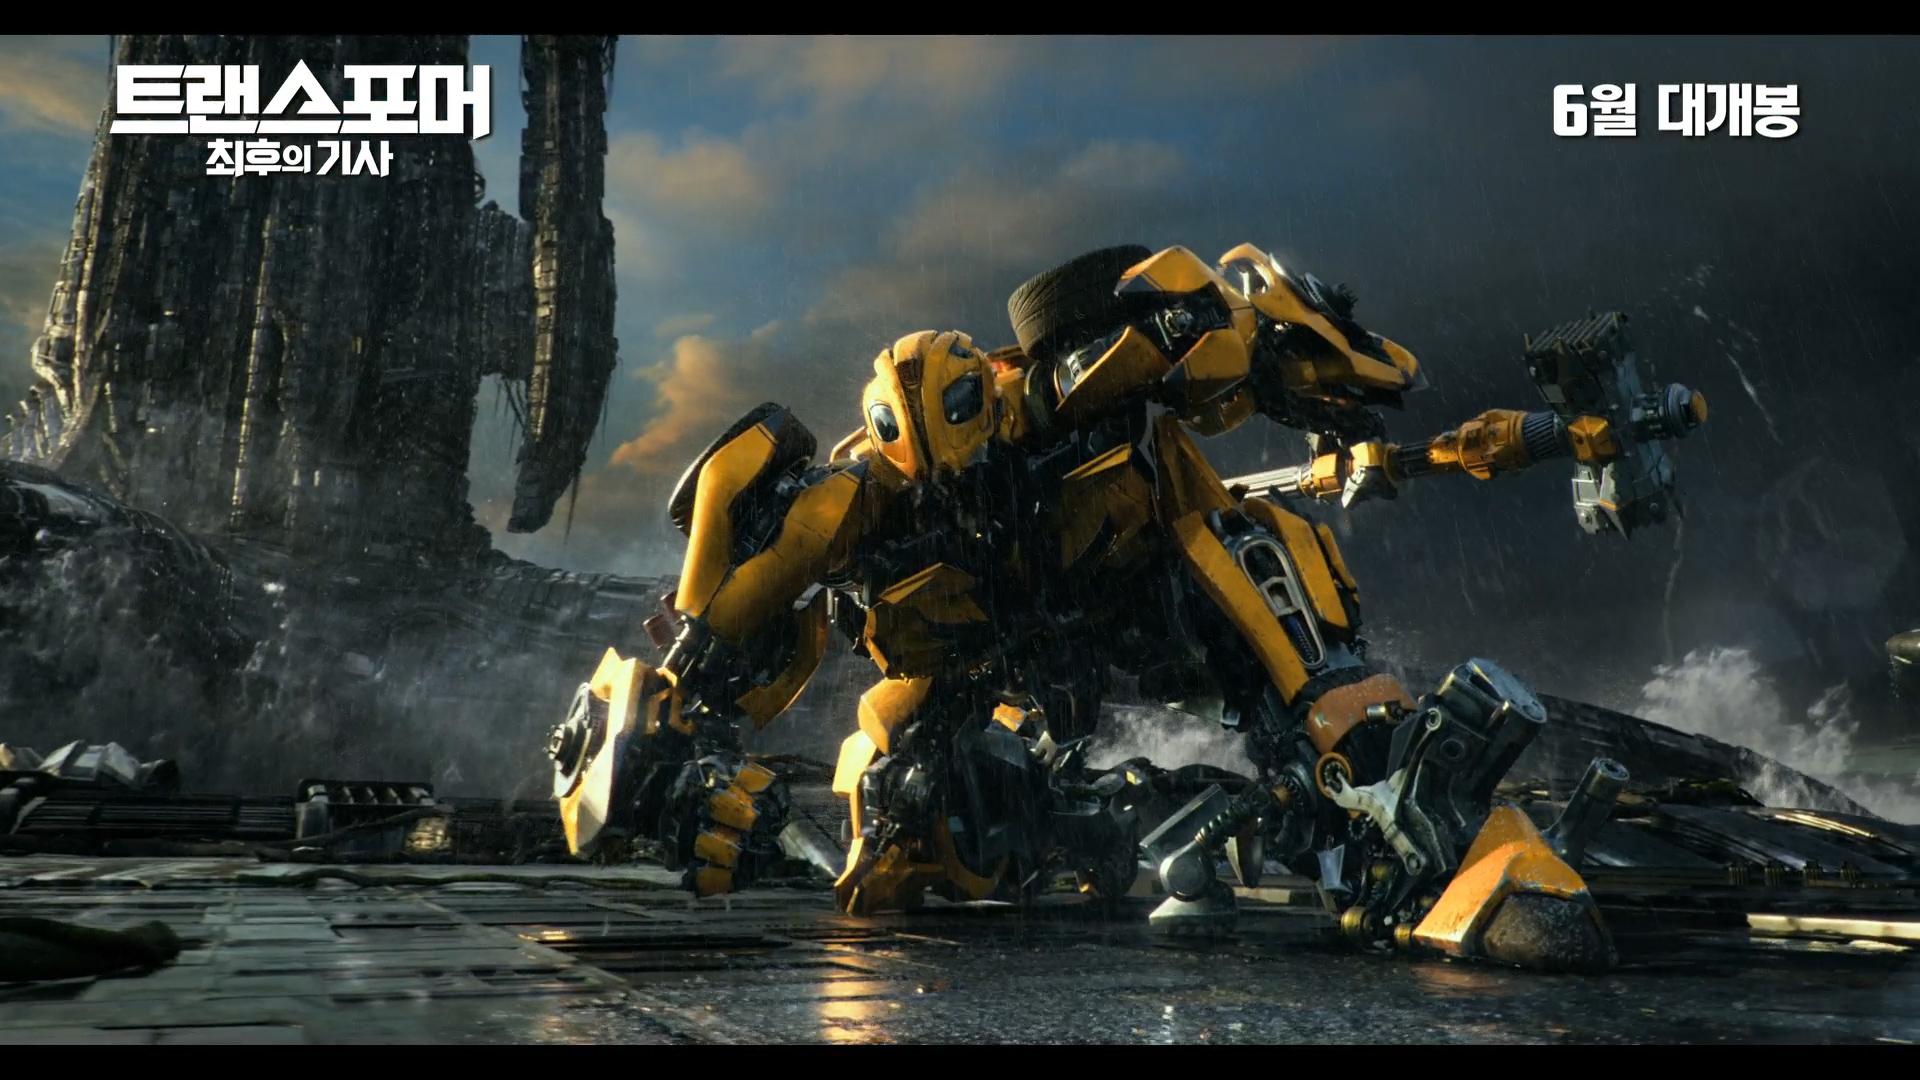 Transformers: The Last Knight Main